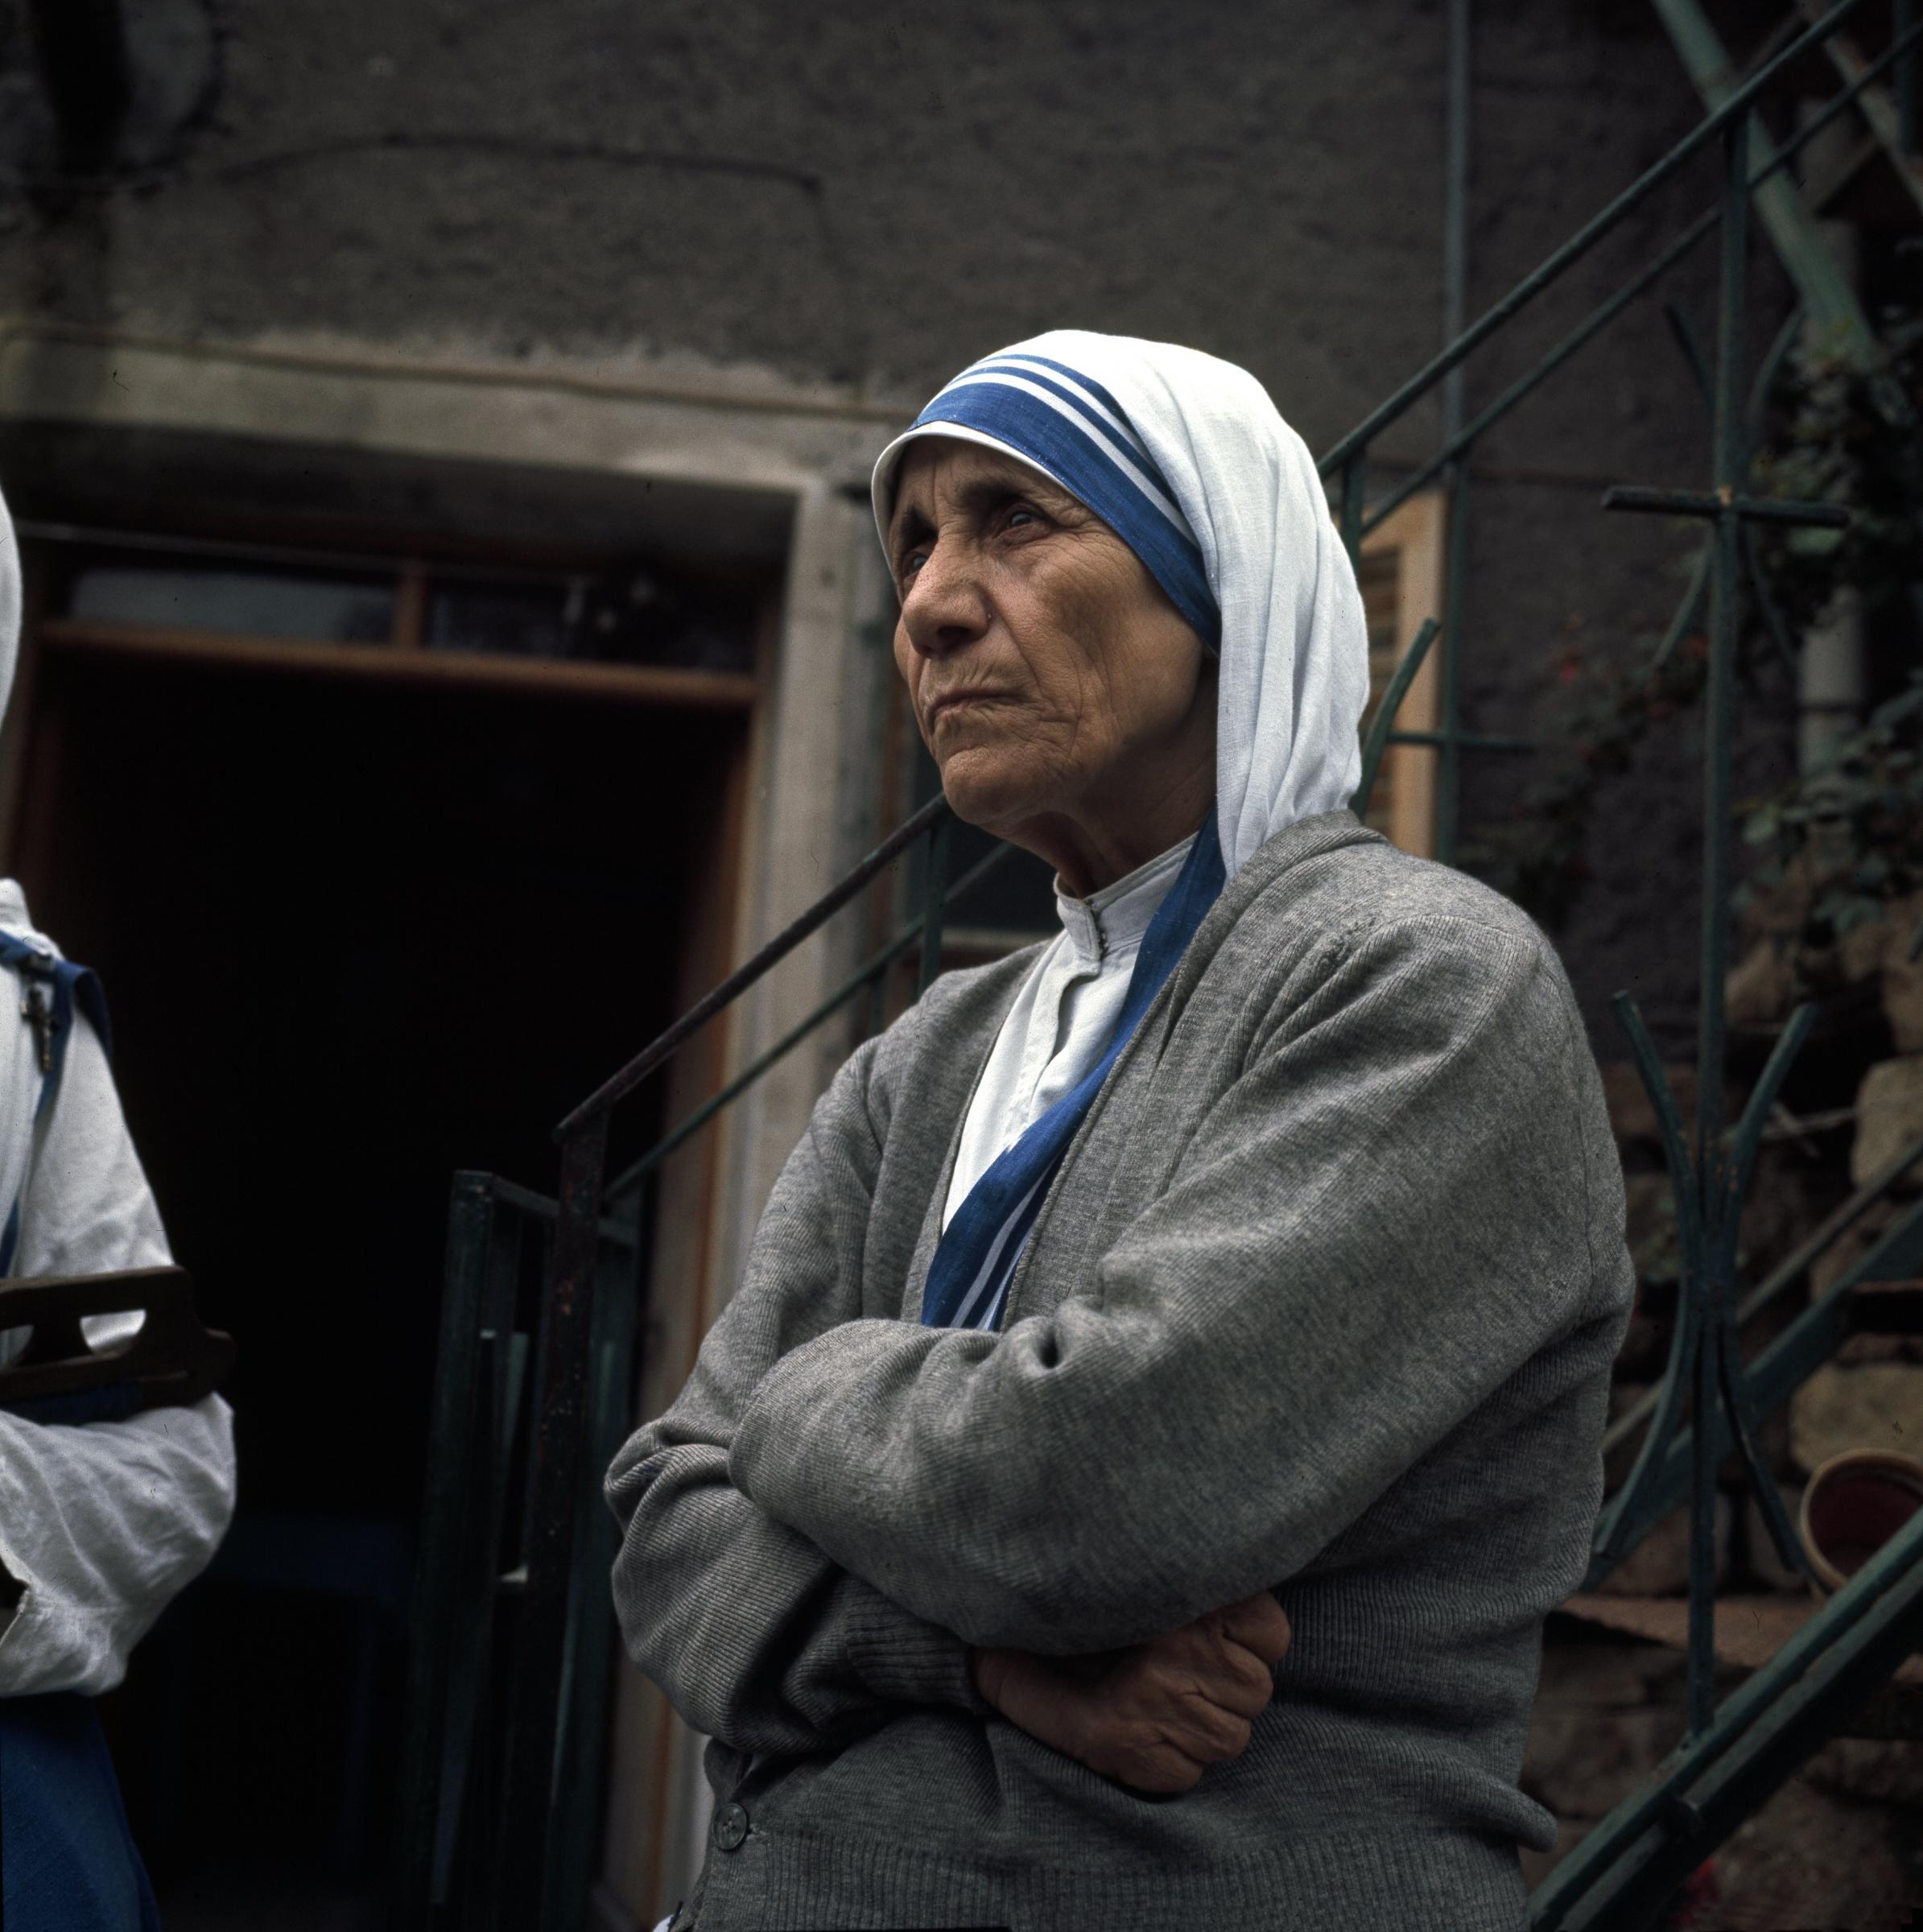 Teresa di Calcutta beata e santa